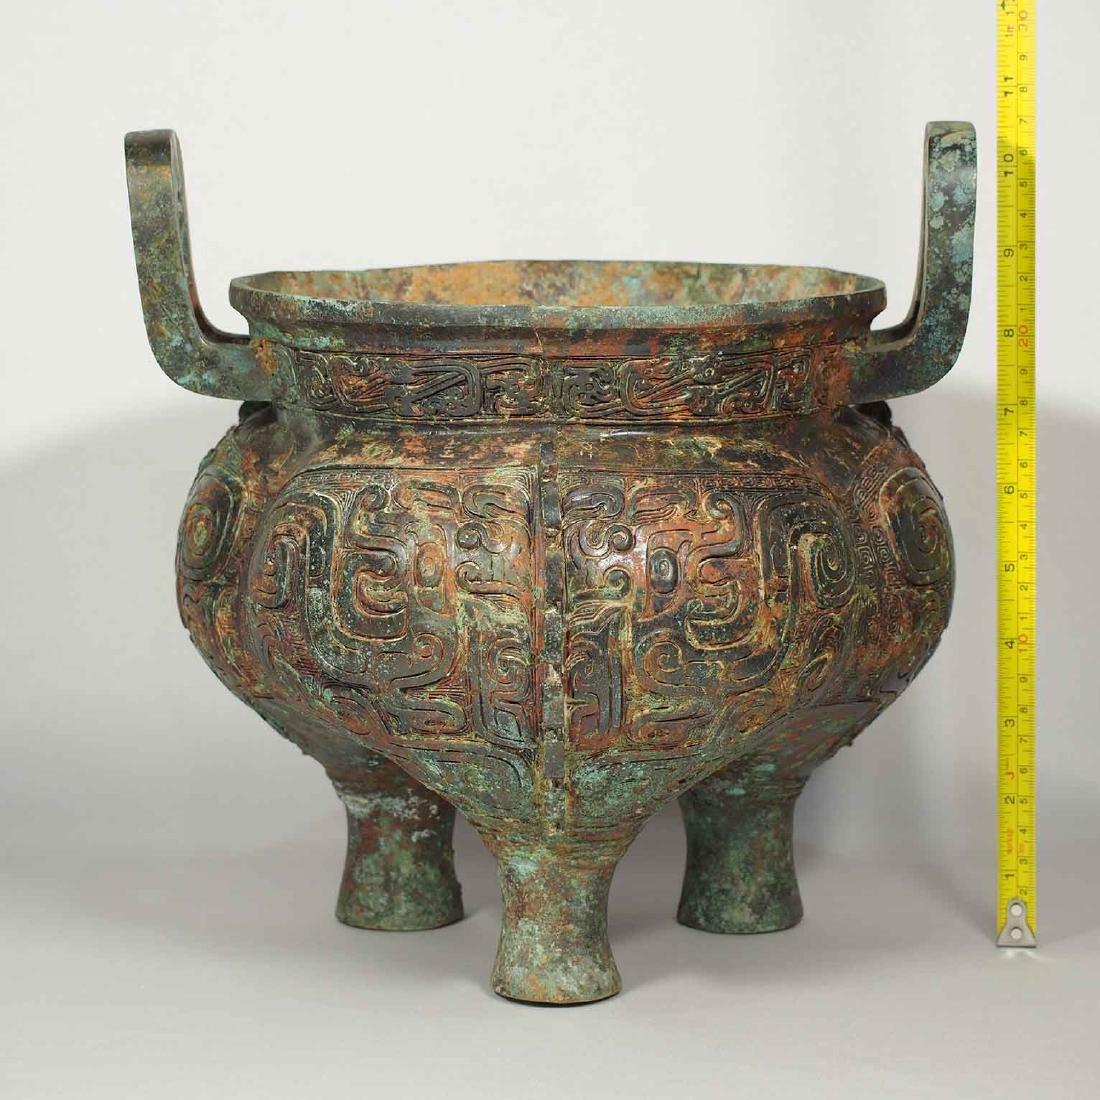 Li Ding' with Inscription and Dragon Design, Shang - 9